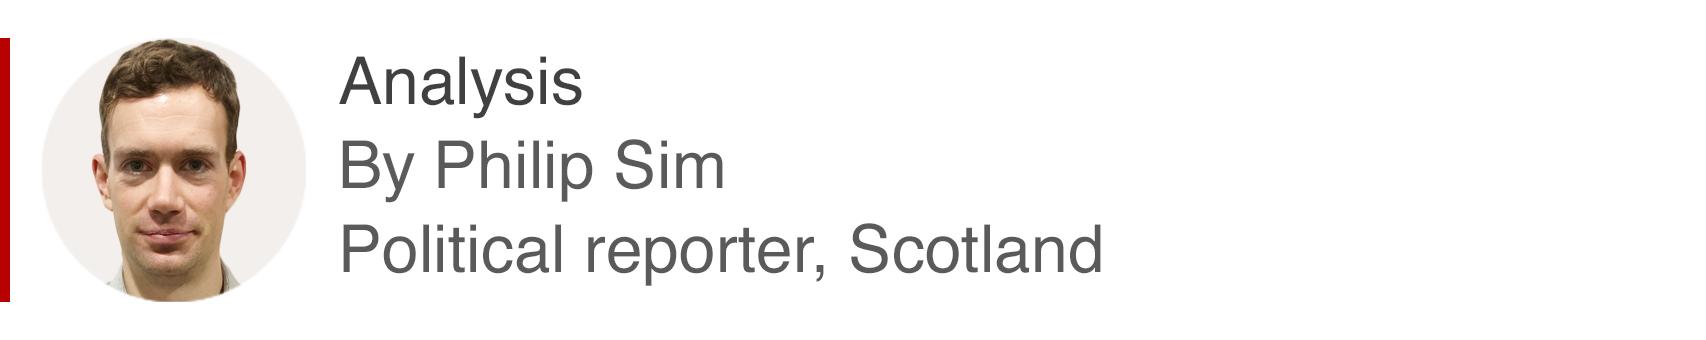 Analysis box by Philip Sim, political reporter, Scotland